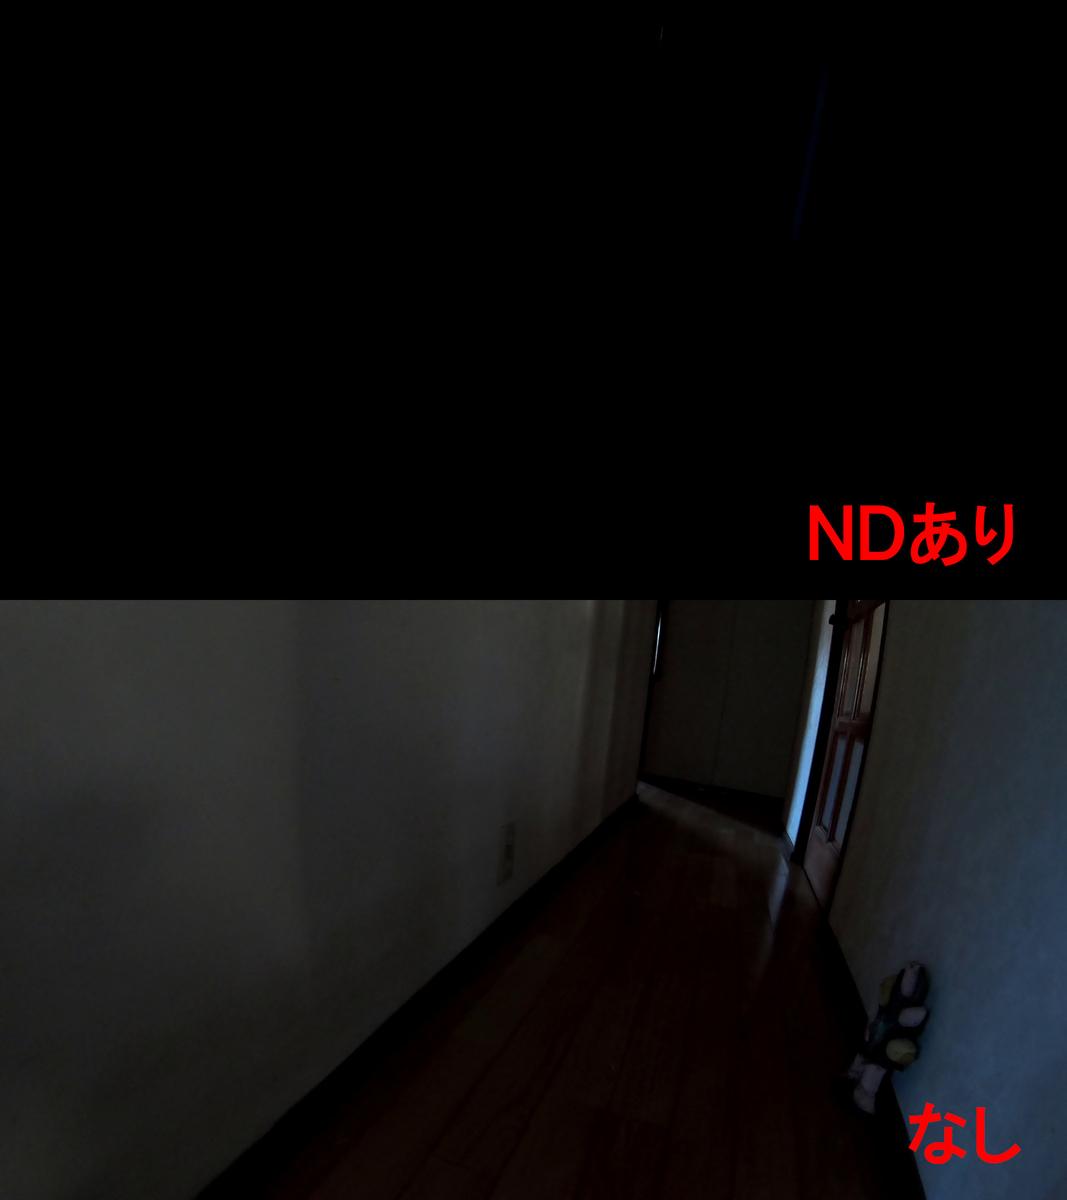 f:id:boku-neko:20190507200010j:plain